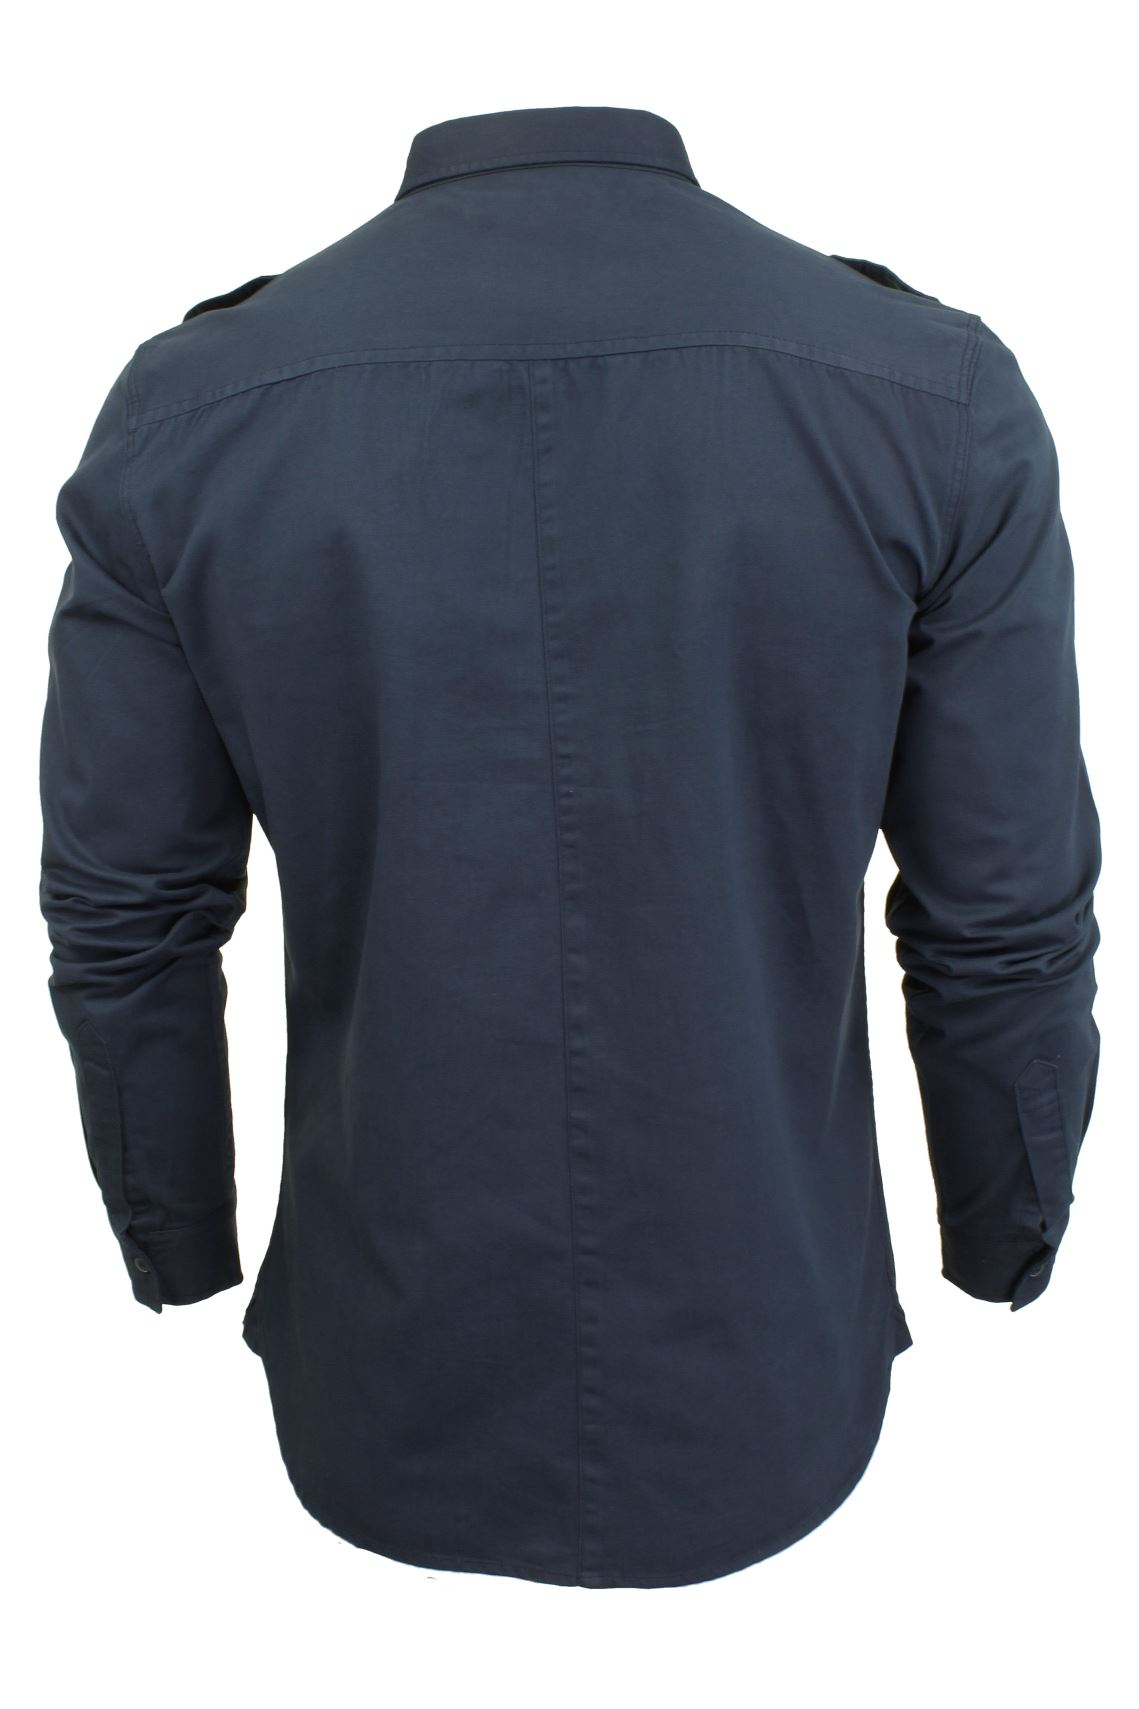 Camisa-para-hombre-por-Firetrap-039-Pittson-039-Manga-Larga miniatura 20